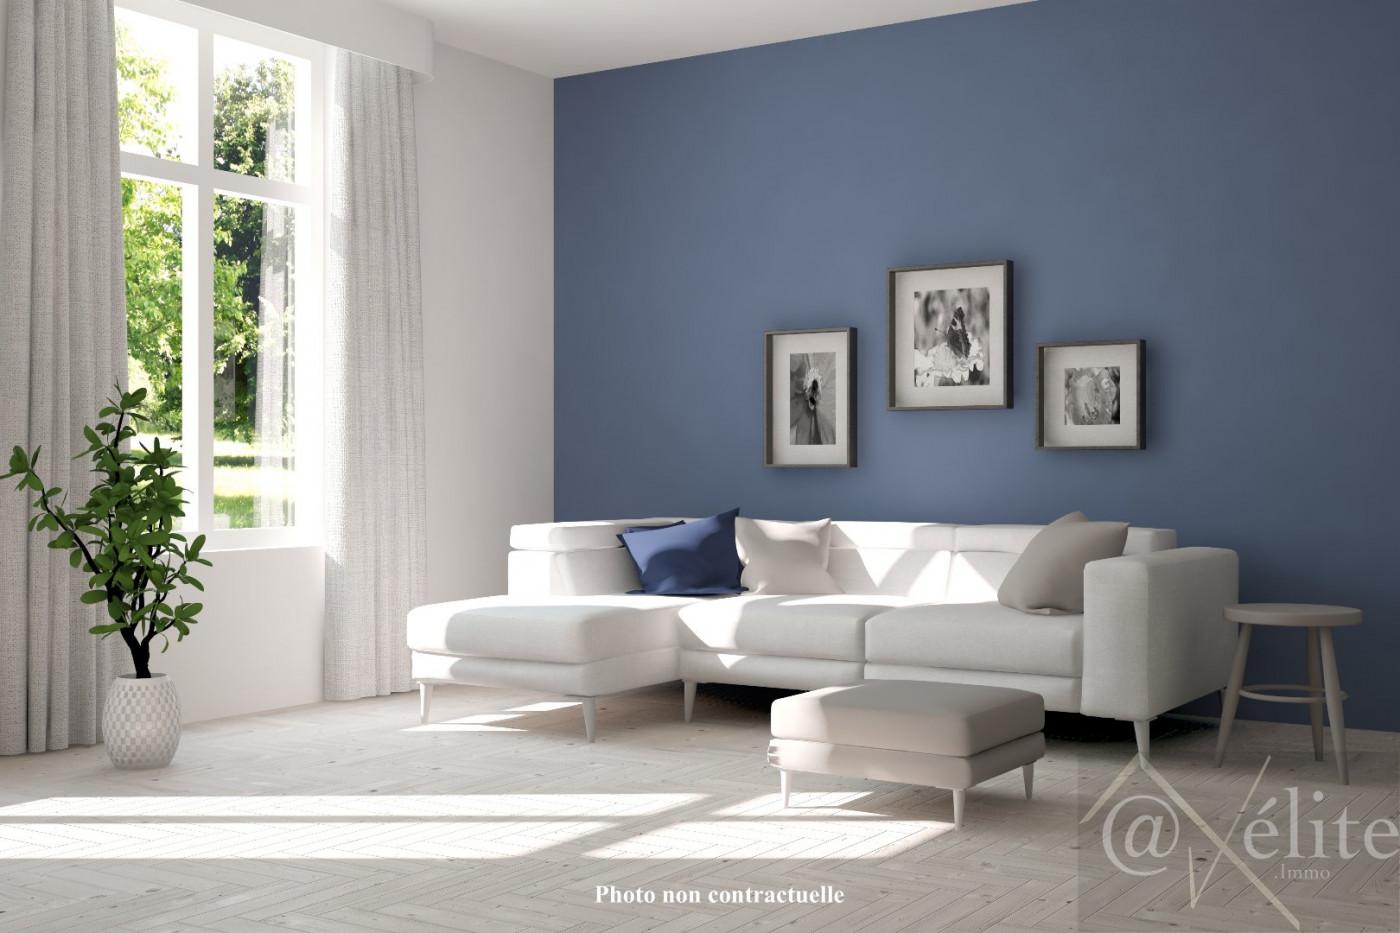 A vendre La Garenne Colombes 777922658 Axelite sas